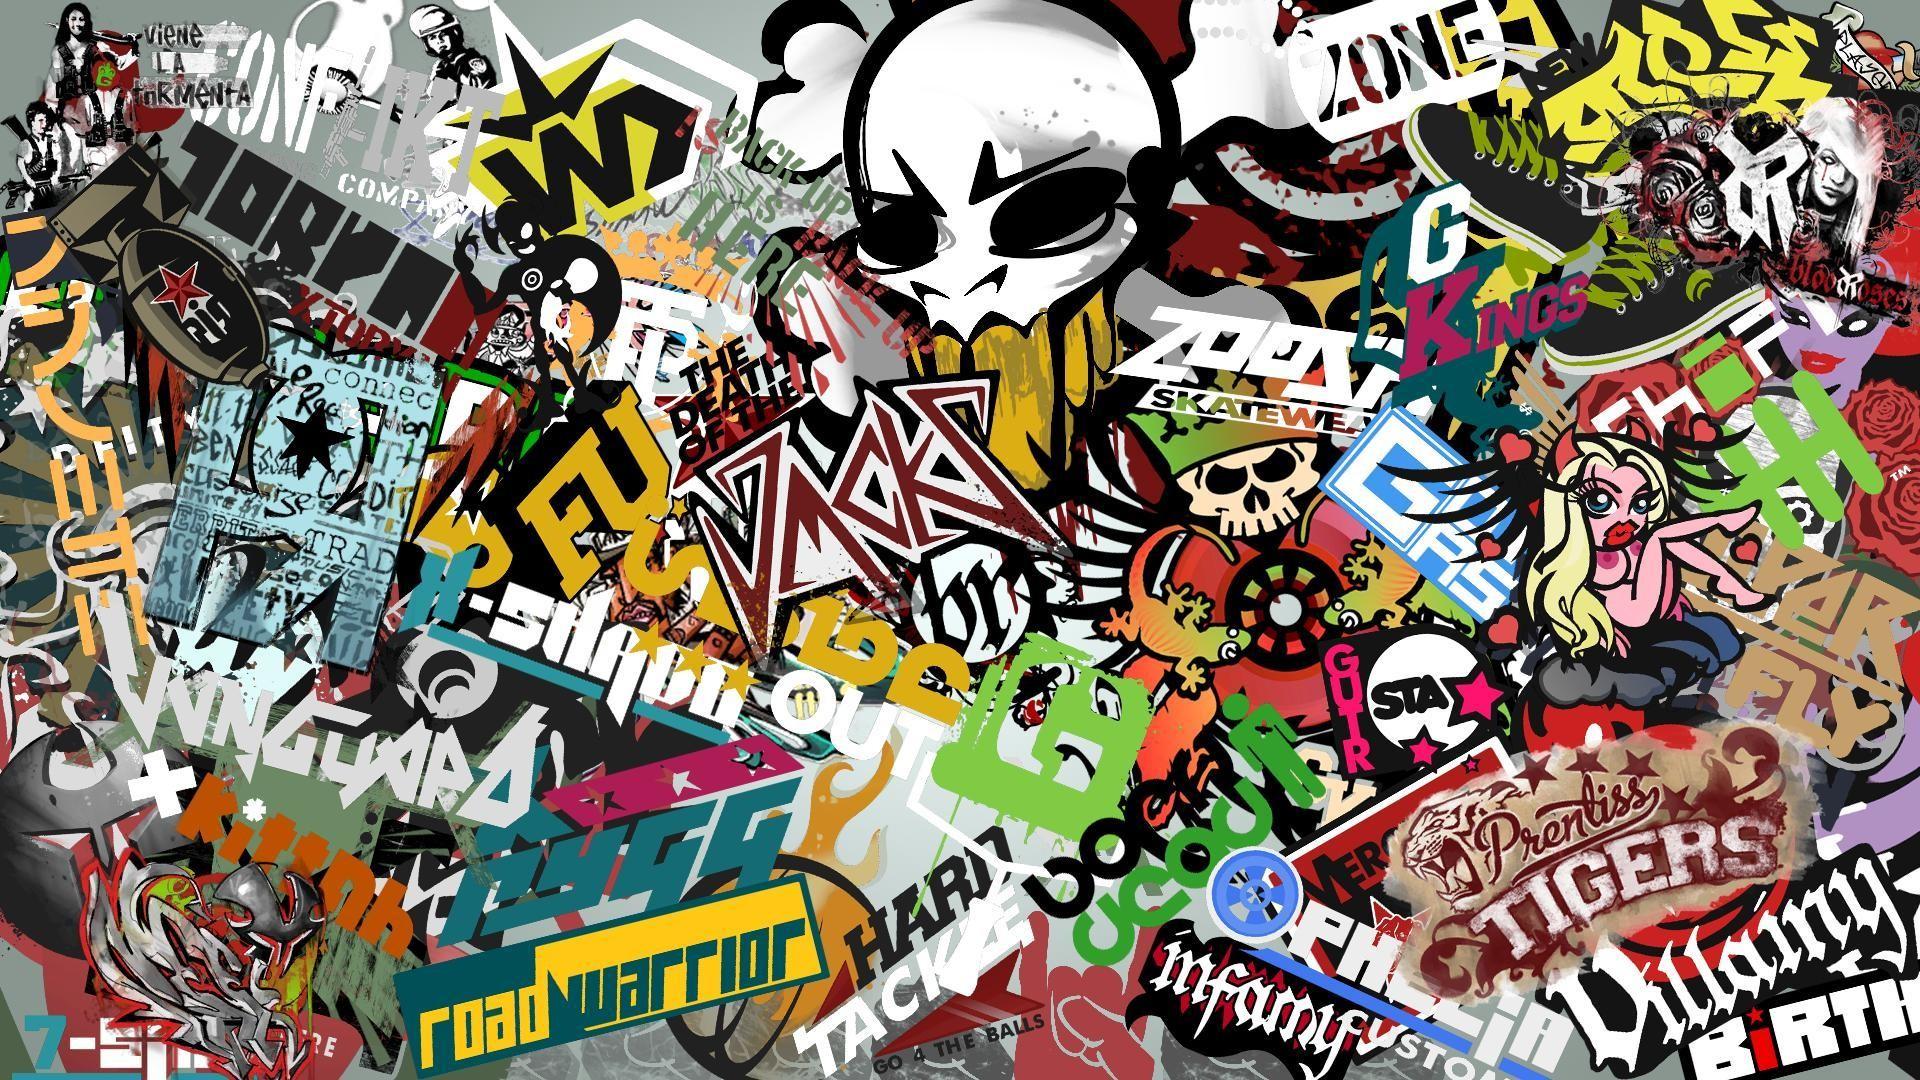 Domo Kun Iphone Wallpaper Jdm Sticker Bomb Wallpaper 45 Images